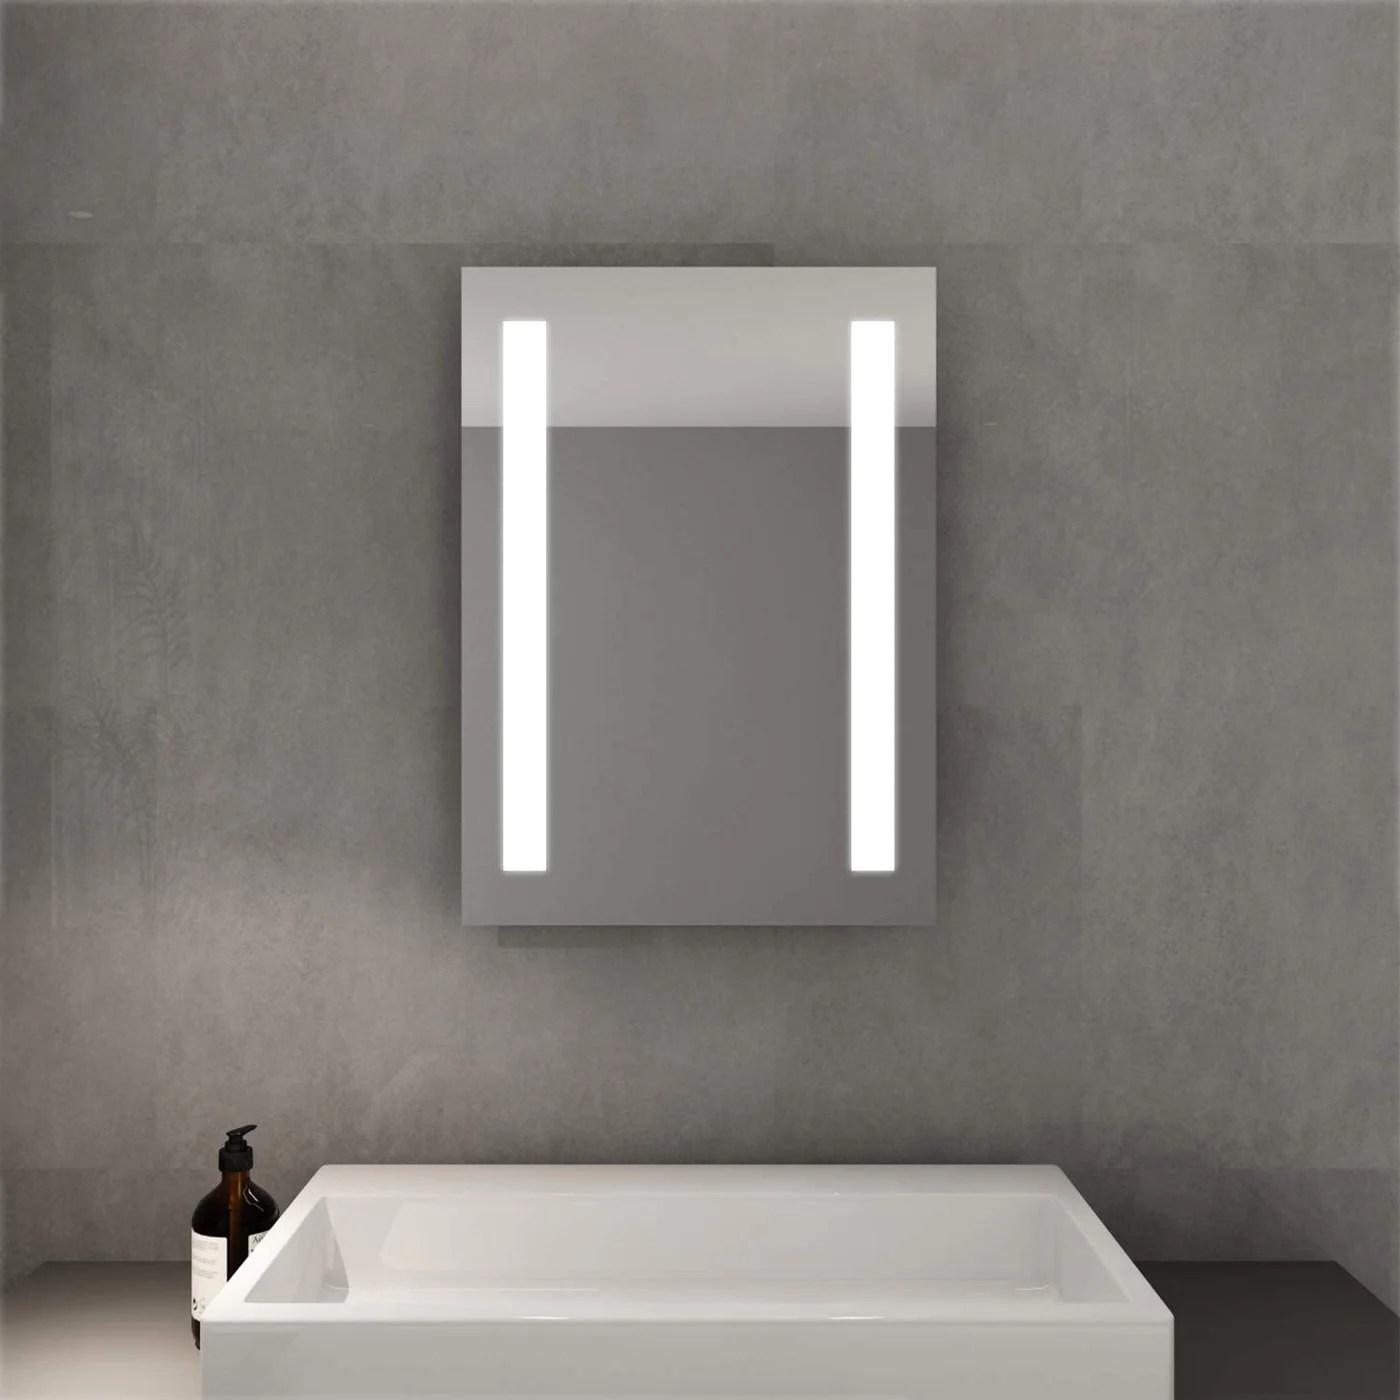 Led Licht Badezimmerspiegel Beleuchtete Badezimmerspiegel Cosmark Www Cosmark De